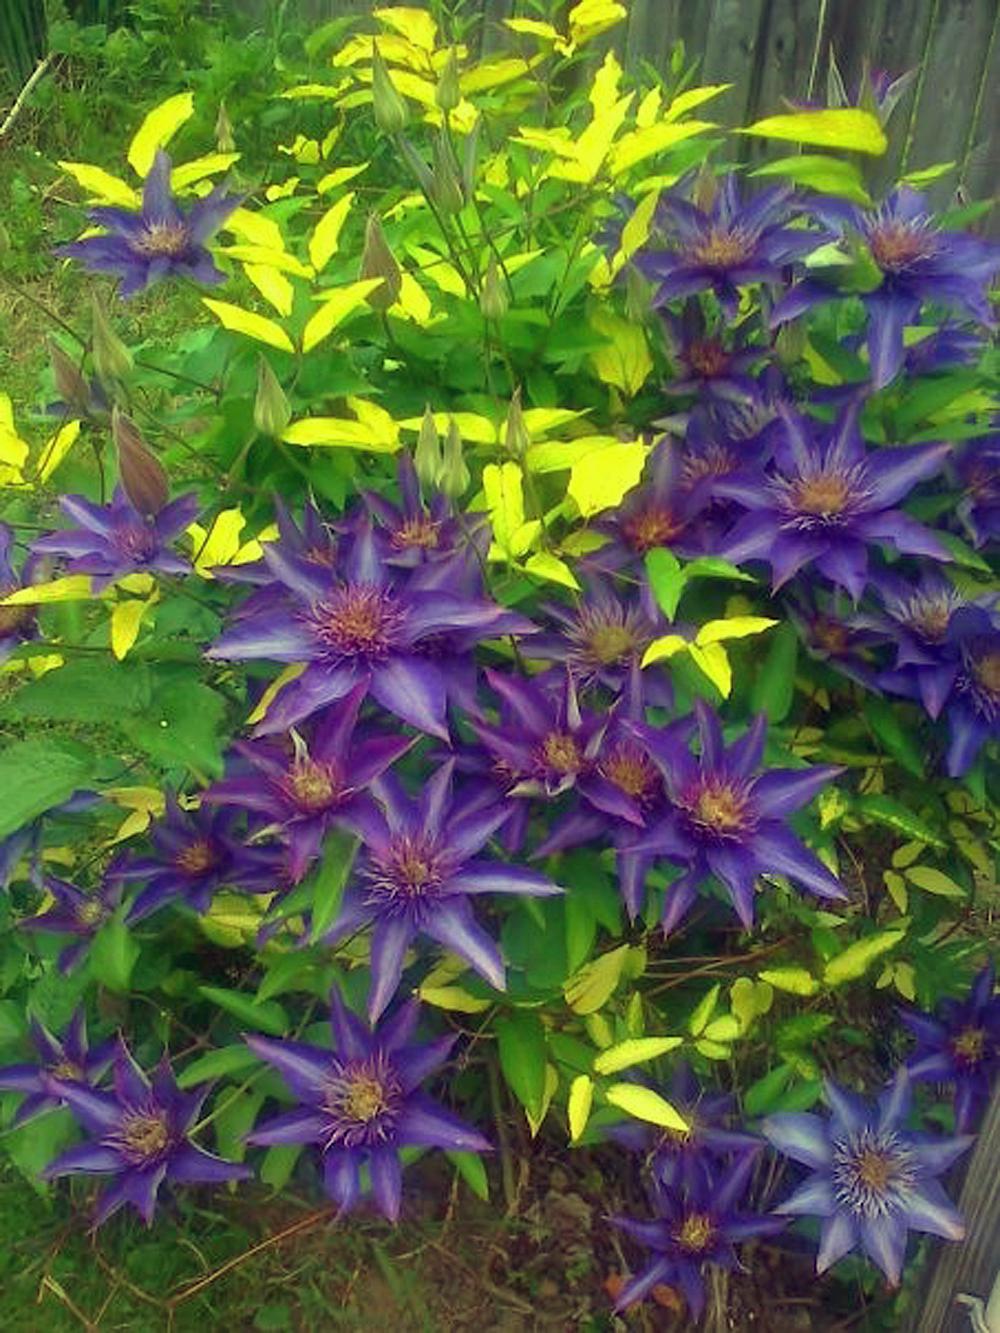 Wild flowers photo